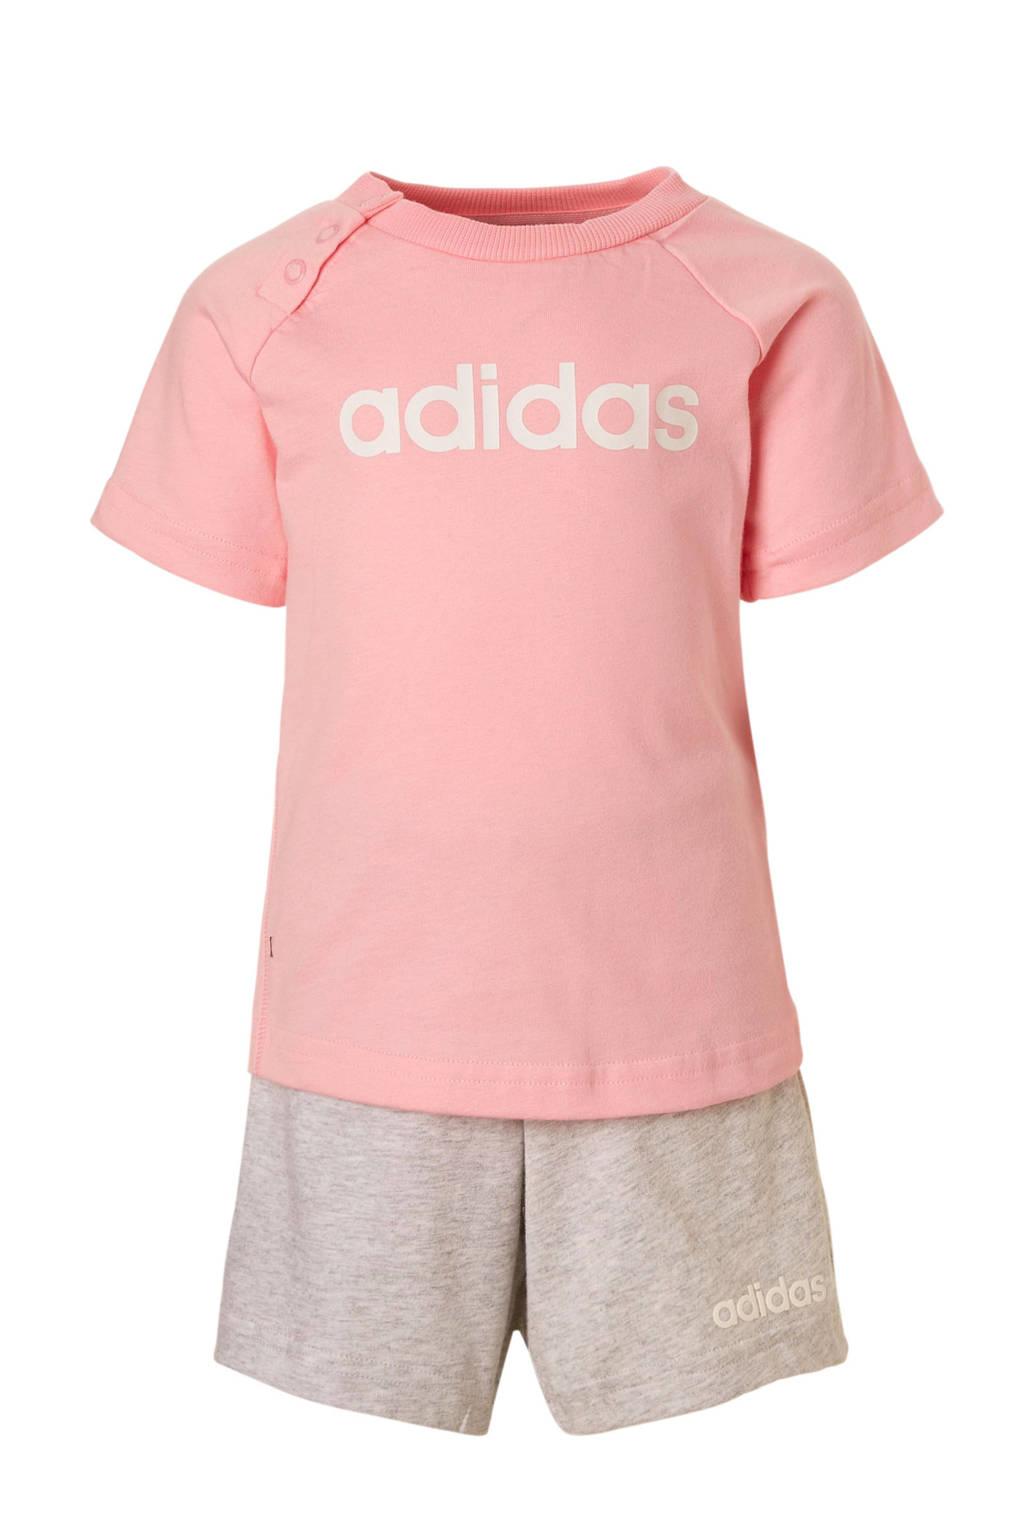 adidas performance T-shirt en short roze/grijs, Roze/grijs melange